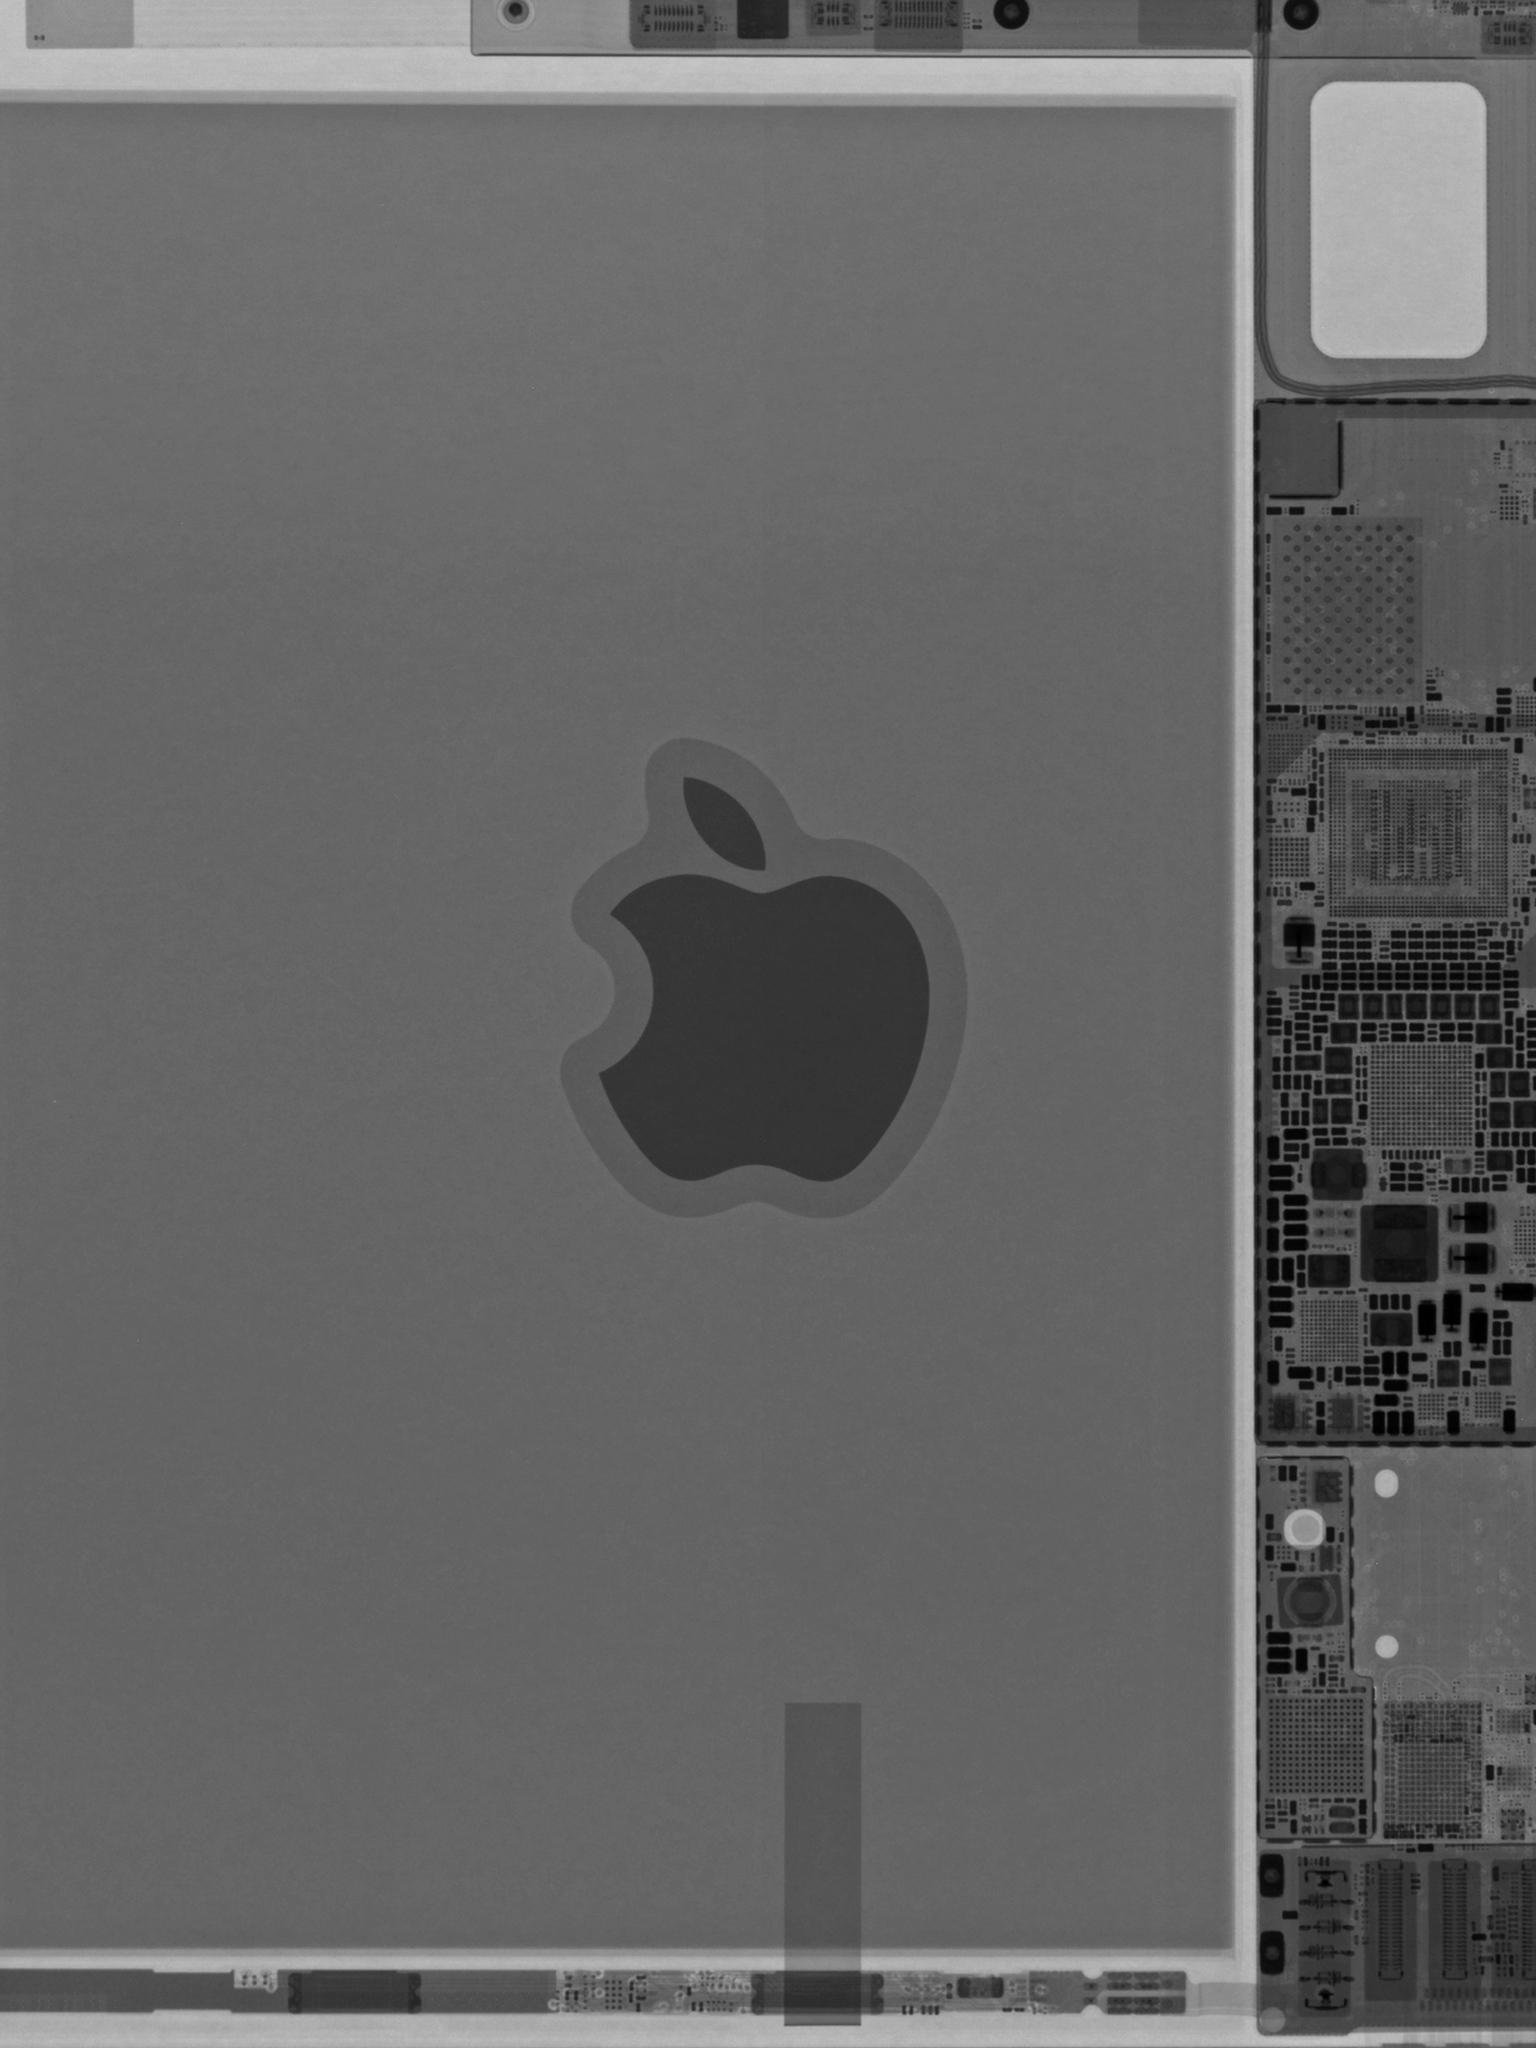 Ifixitが Ipad Mini 第5世代 のスケルトン壁紙を公開 Corriente Top